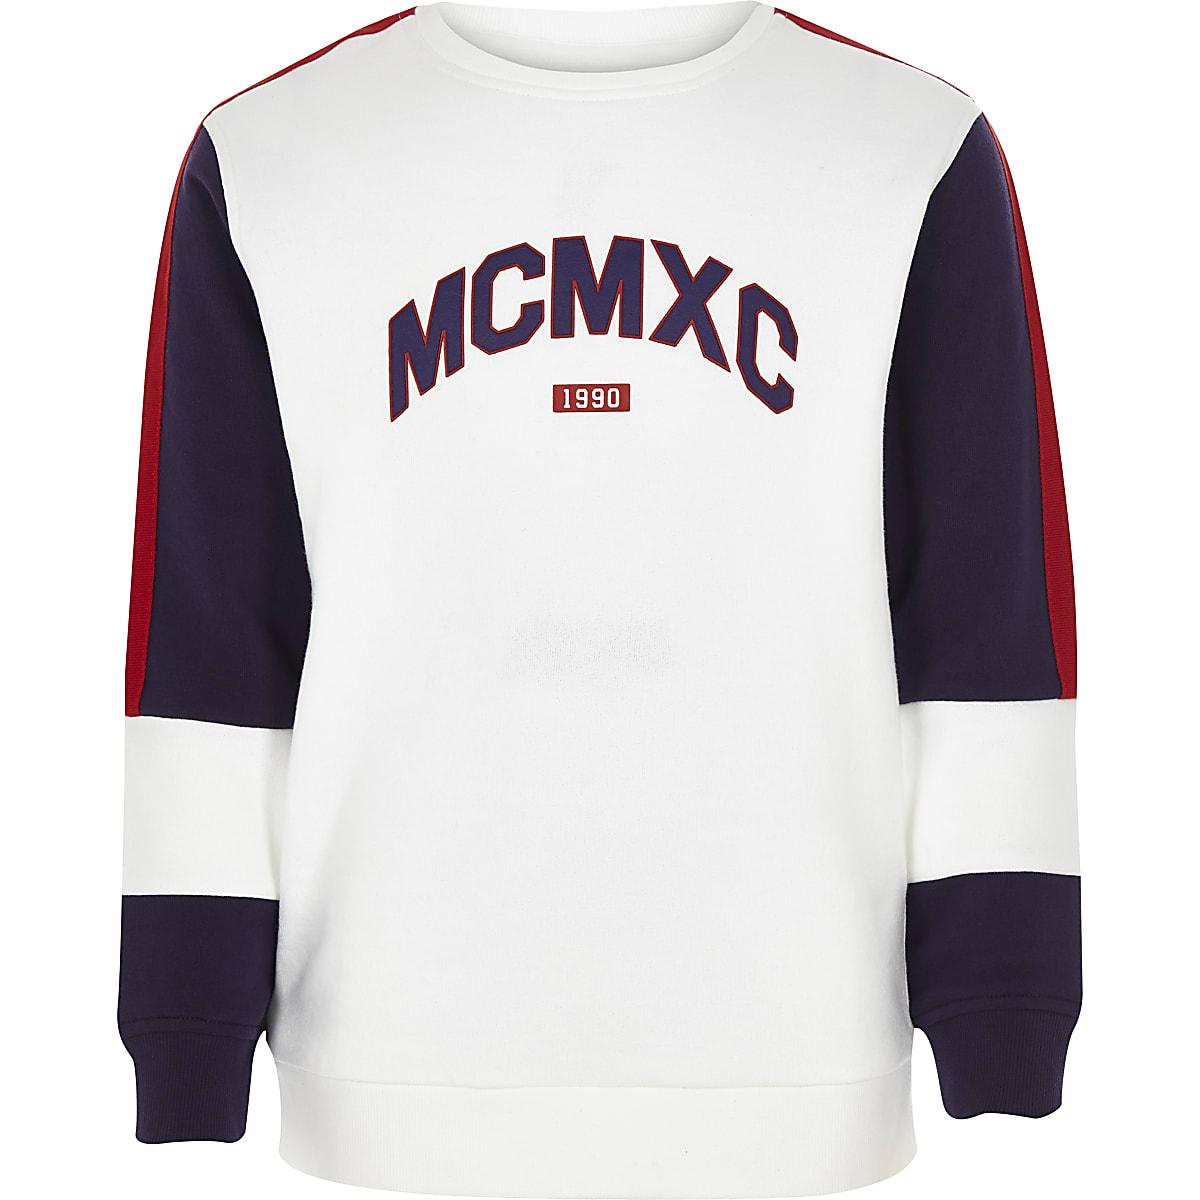 Boys white 'MCMXC' block sweatshirt